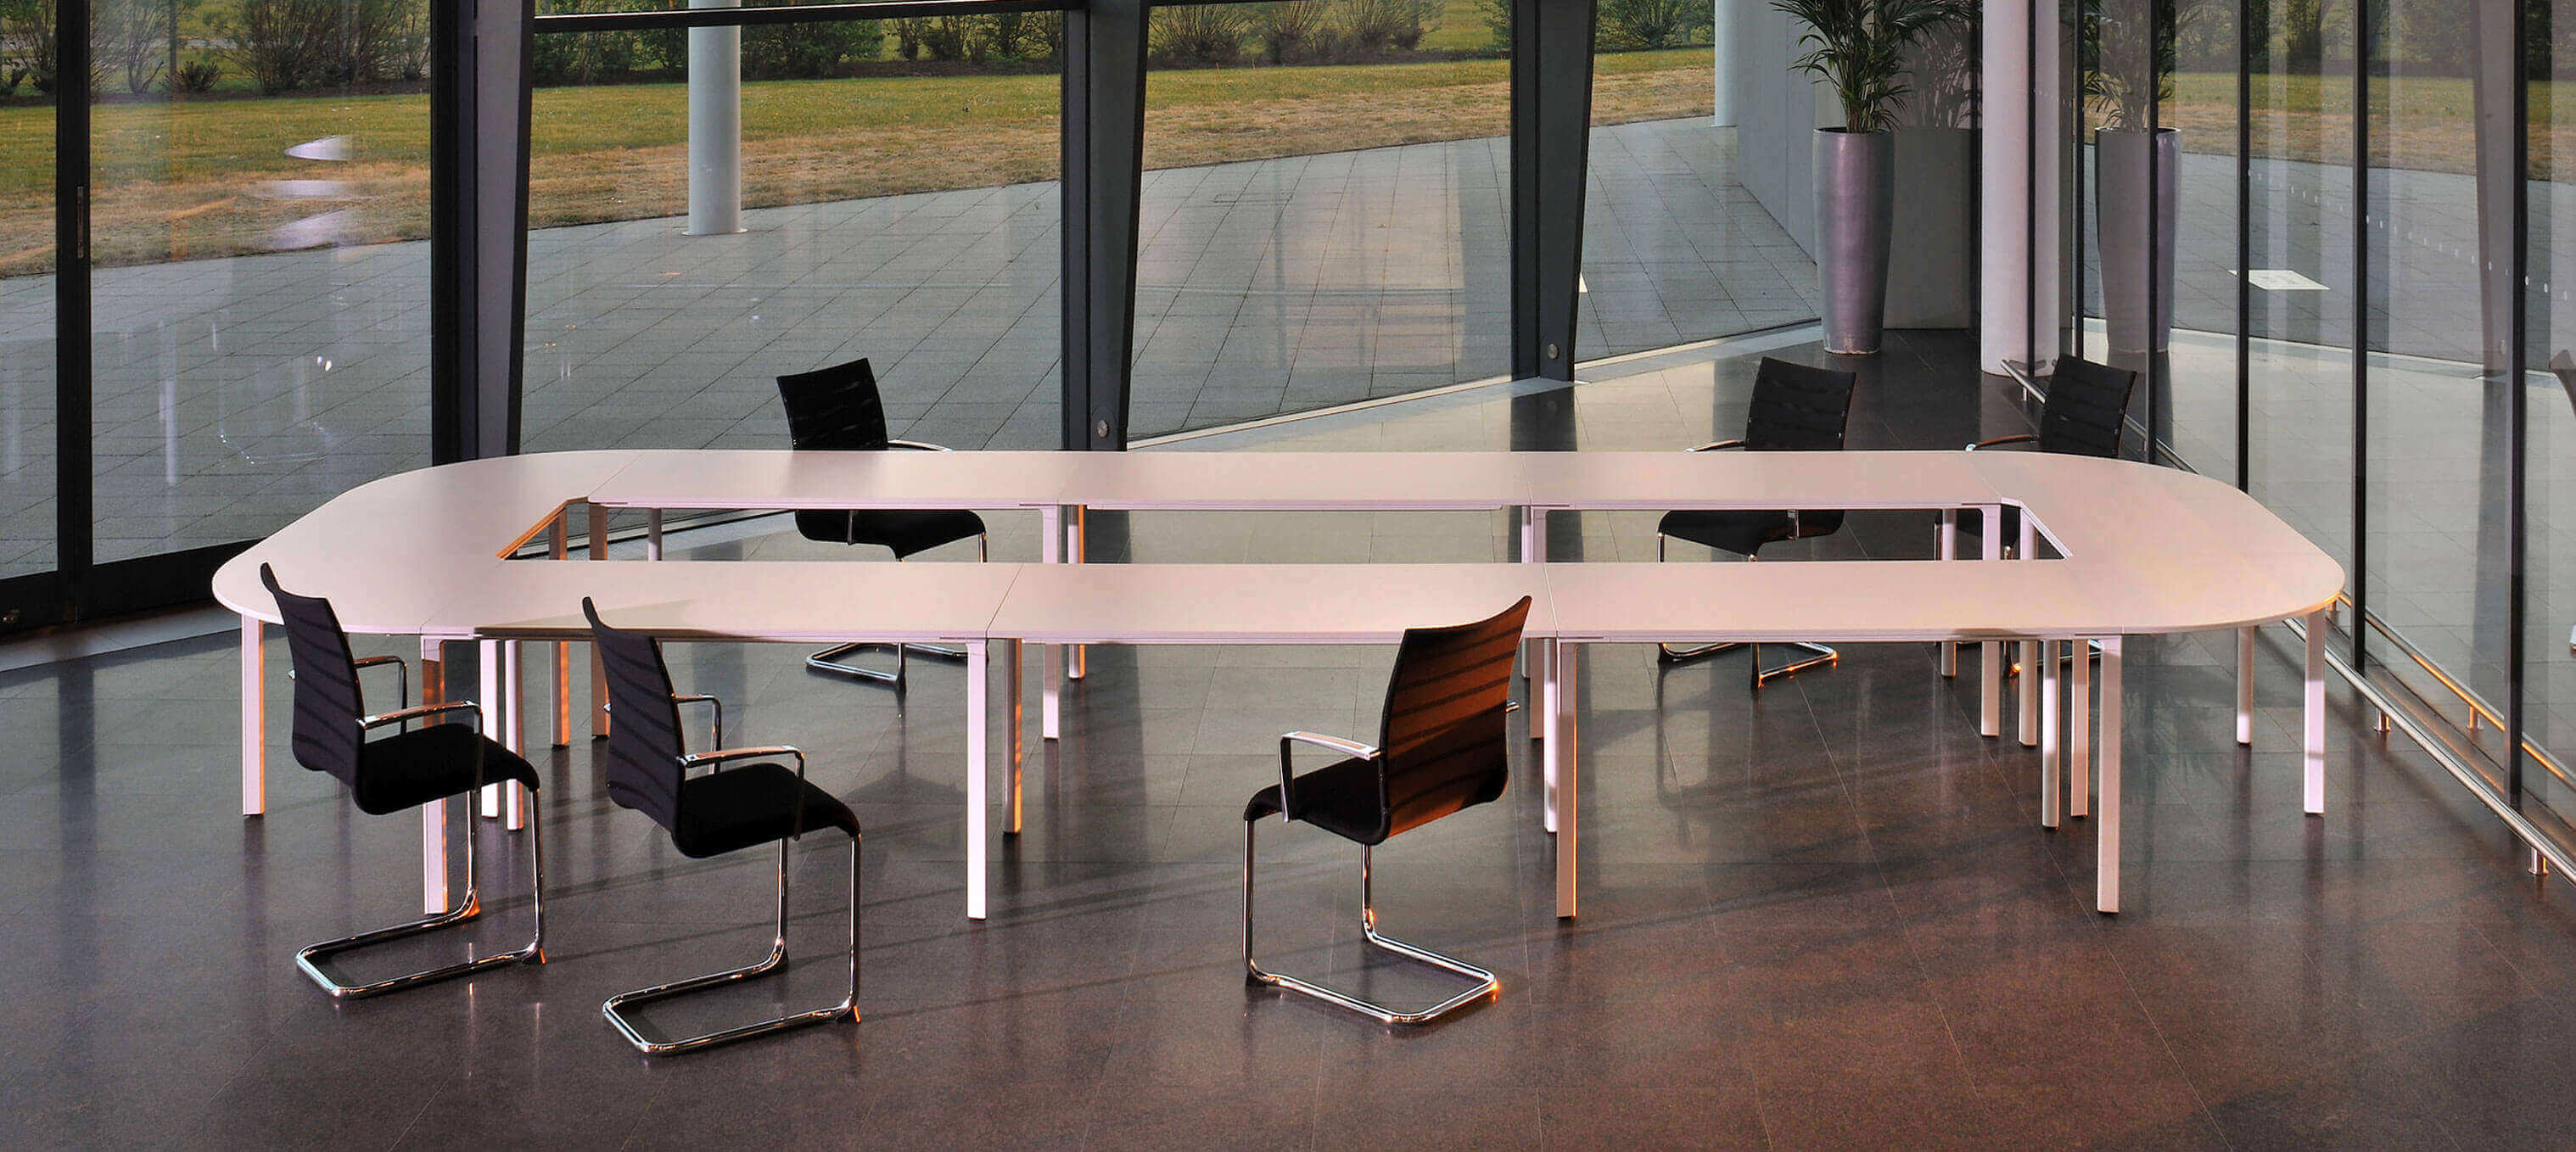 Burgess Meet-U - Office Seating Showcase 2